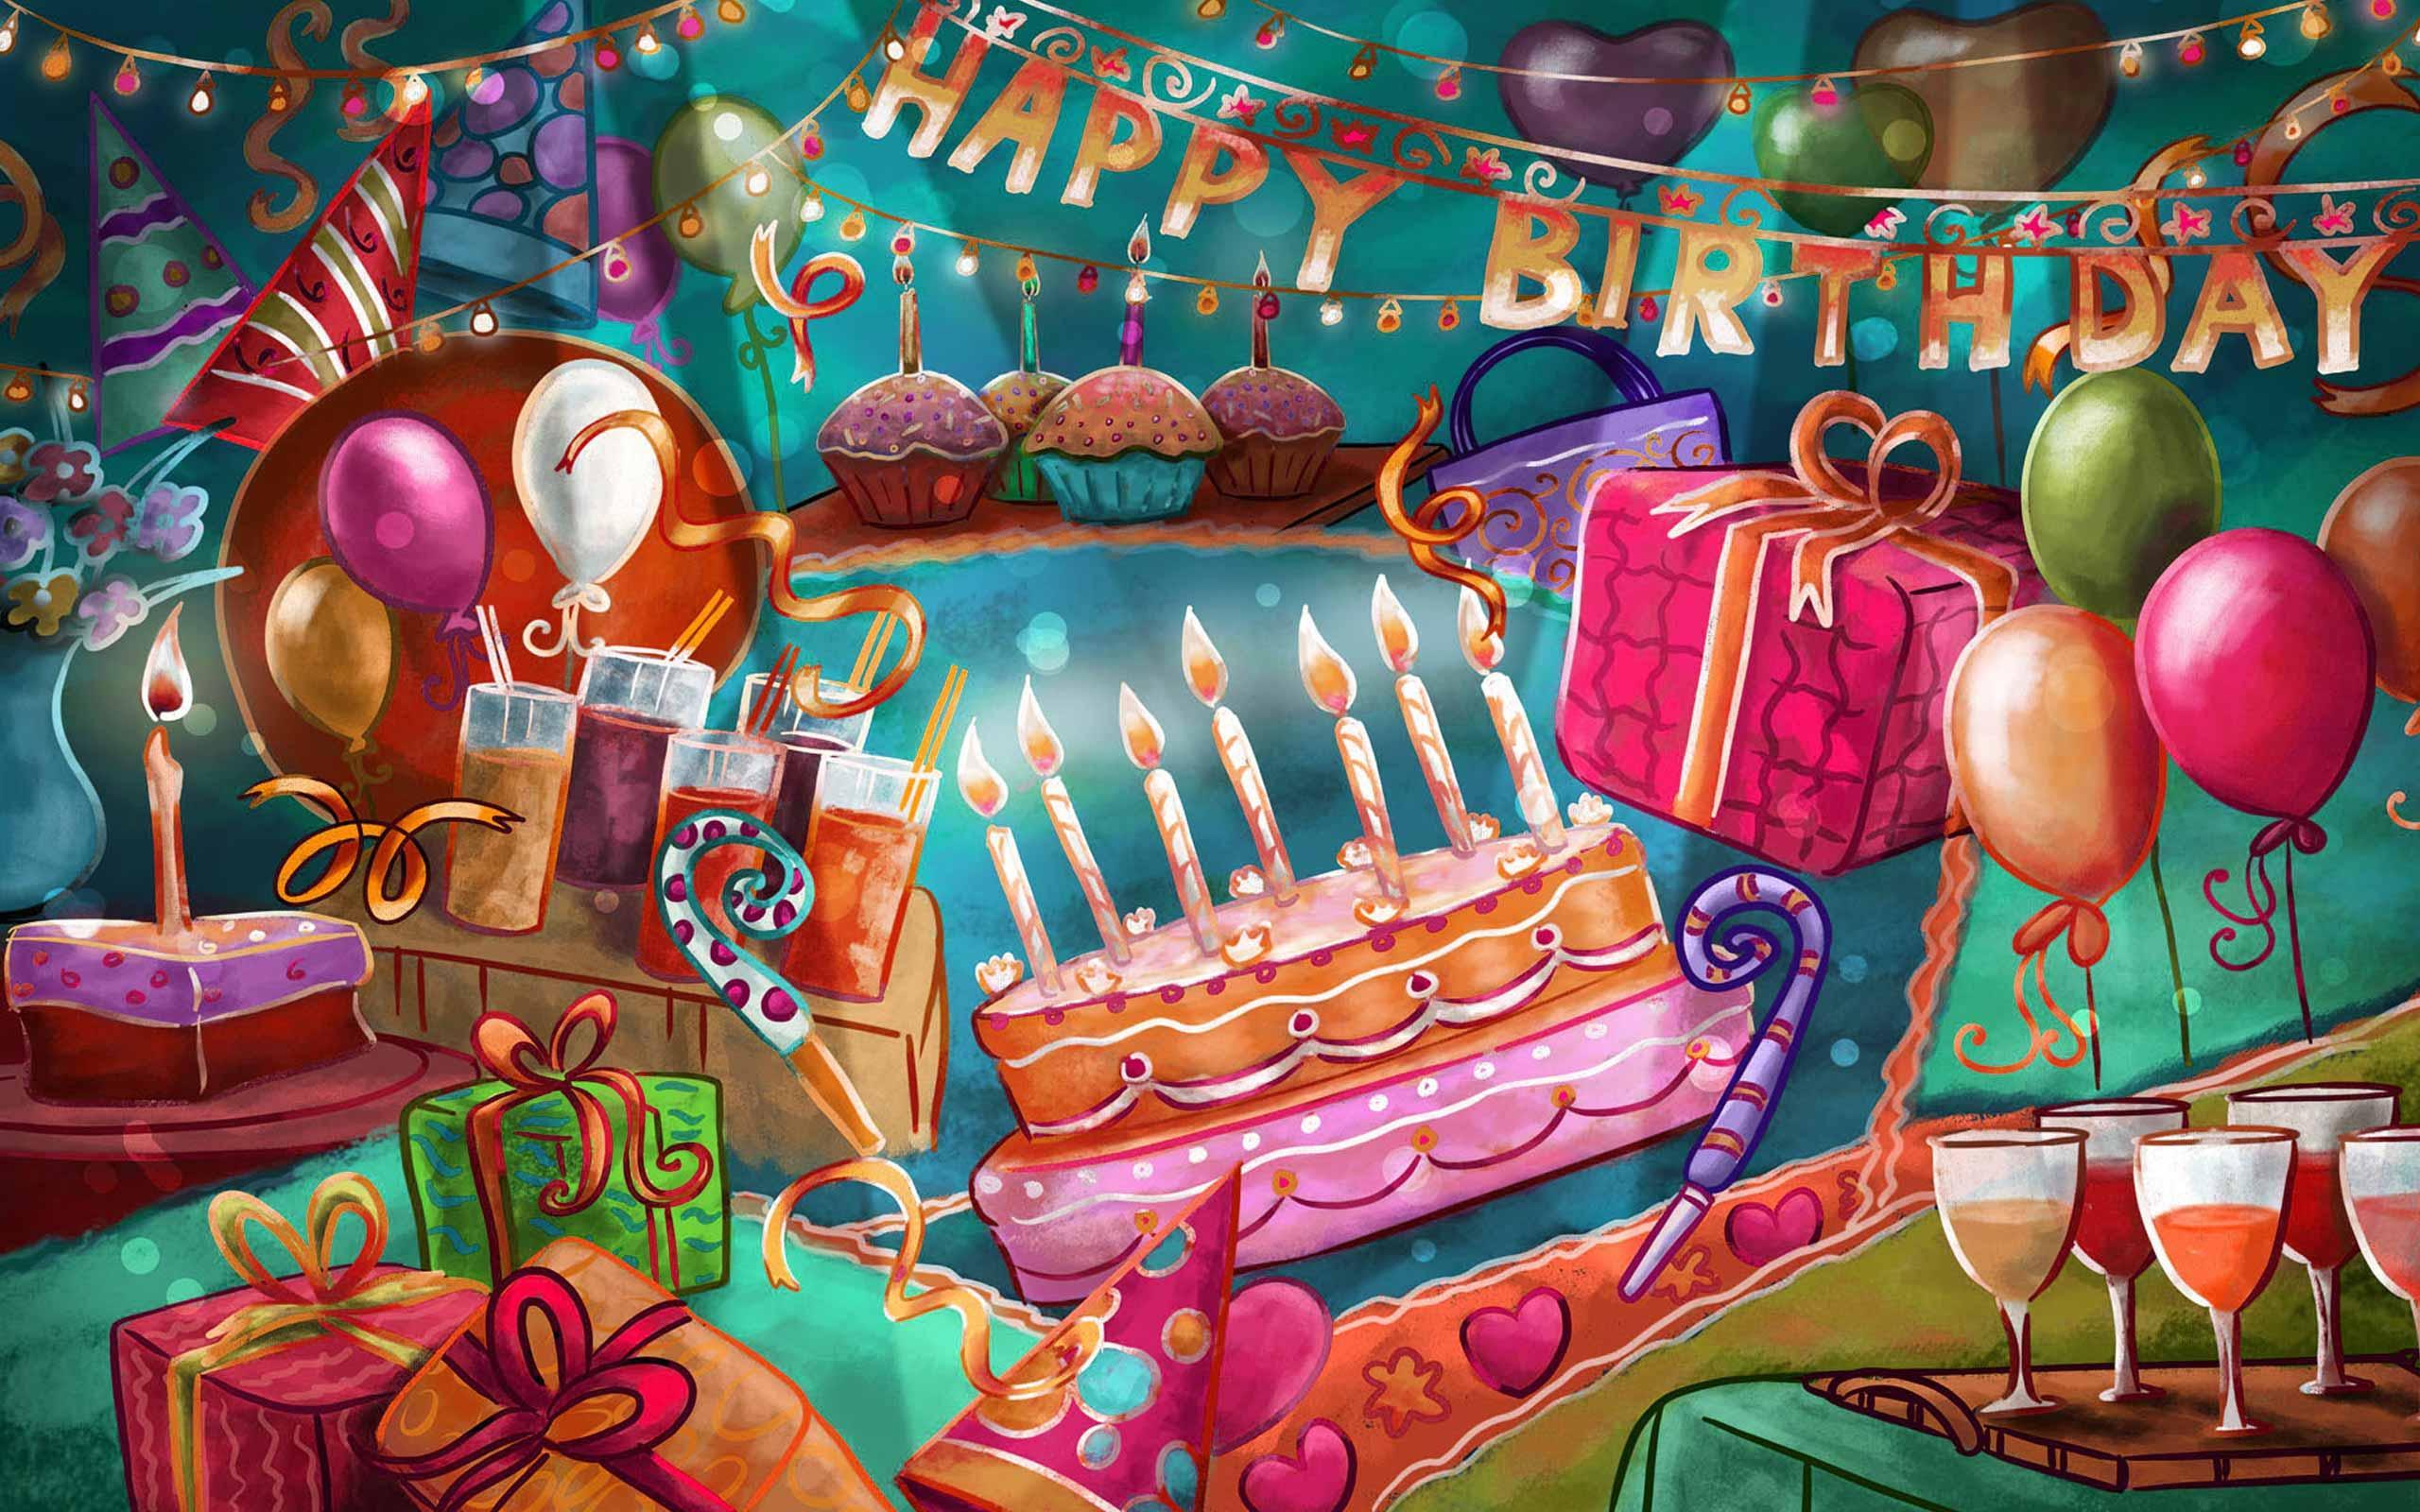 Happy birthday big ron!!!!!!!!!!!!!!!!!!!!!!!!!!!!!!!!!!!!!!!!!!!!!!!